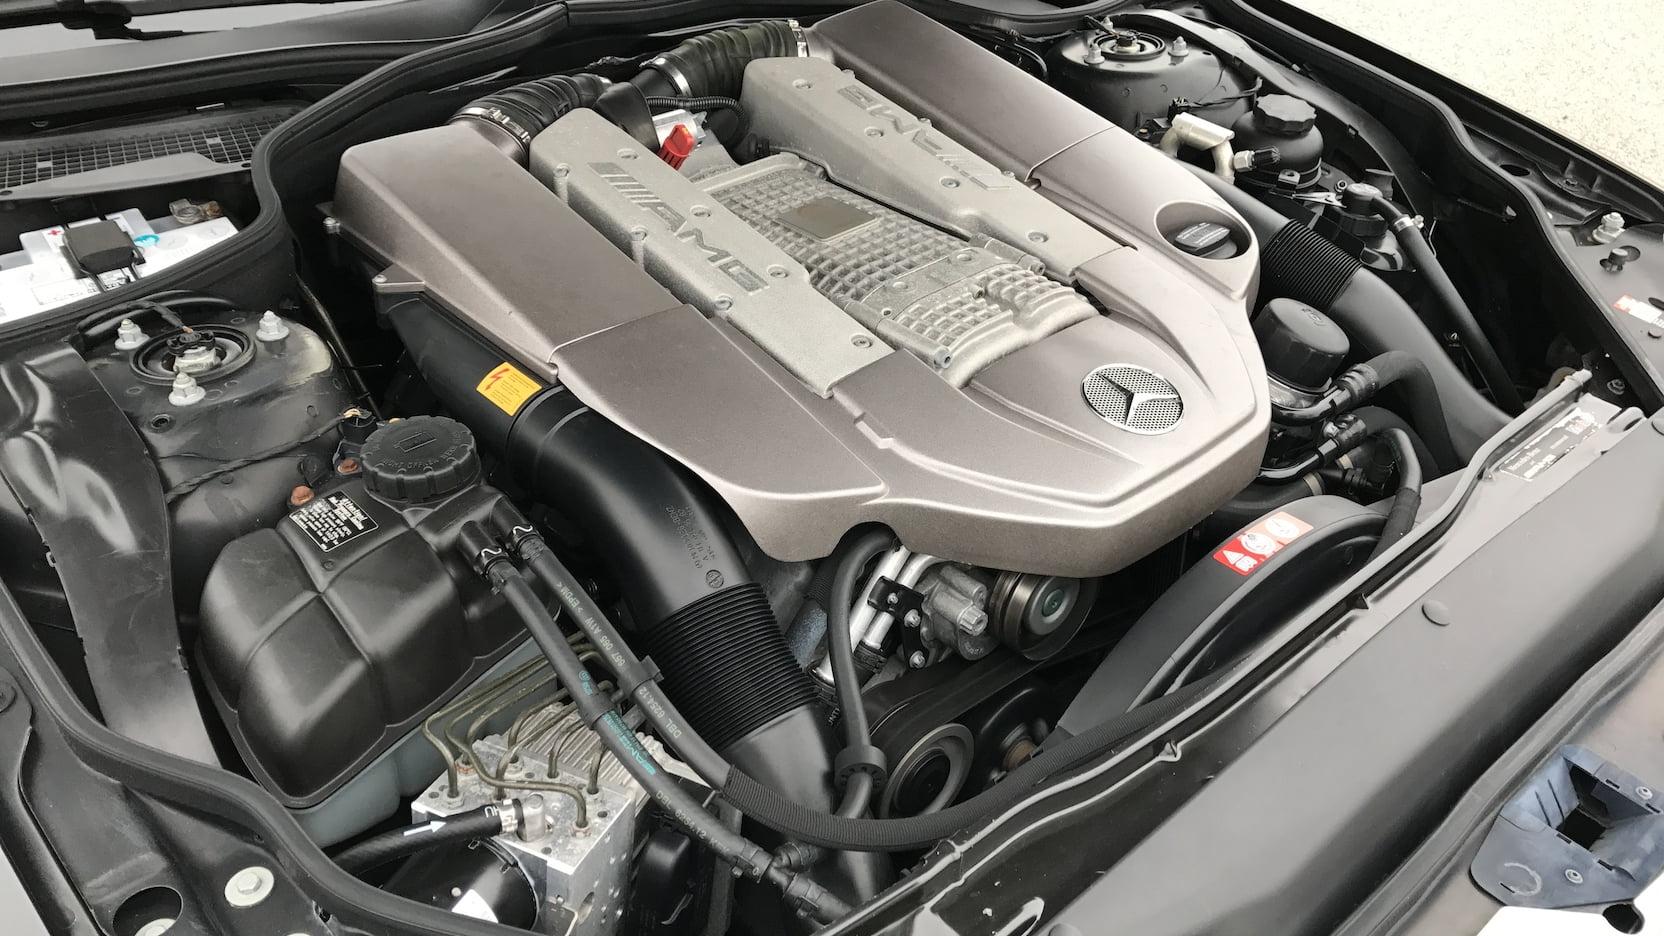 Mercedes-Benz SL 55 AMG Двигатель